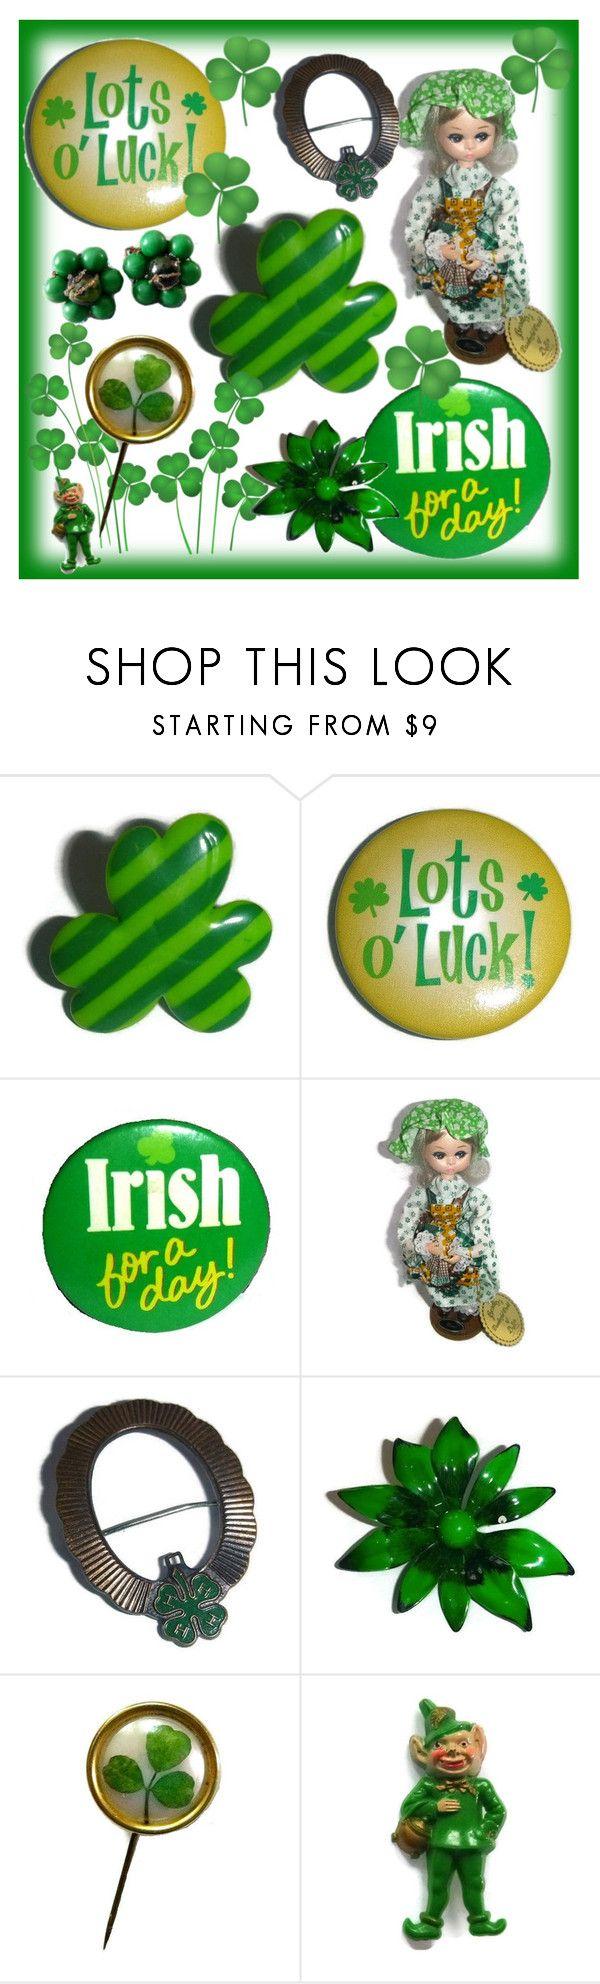 Vintage St Patrick's Day! 🍀💚☘ by popcornvintagebytann on Polyvore featuring vintage